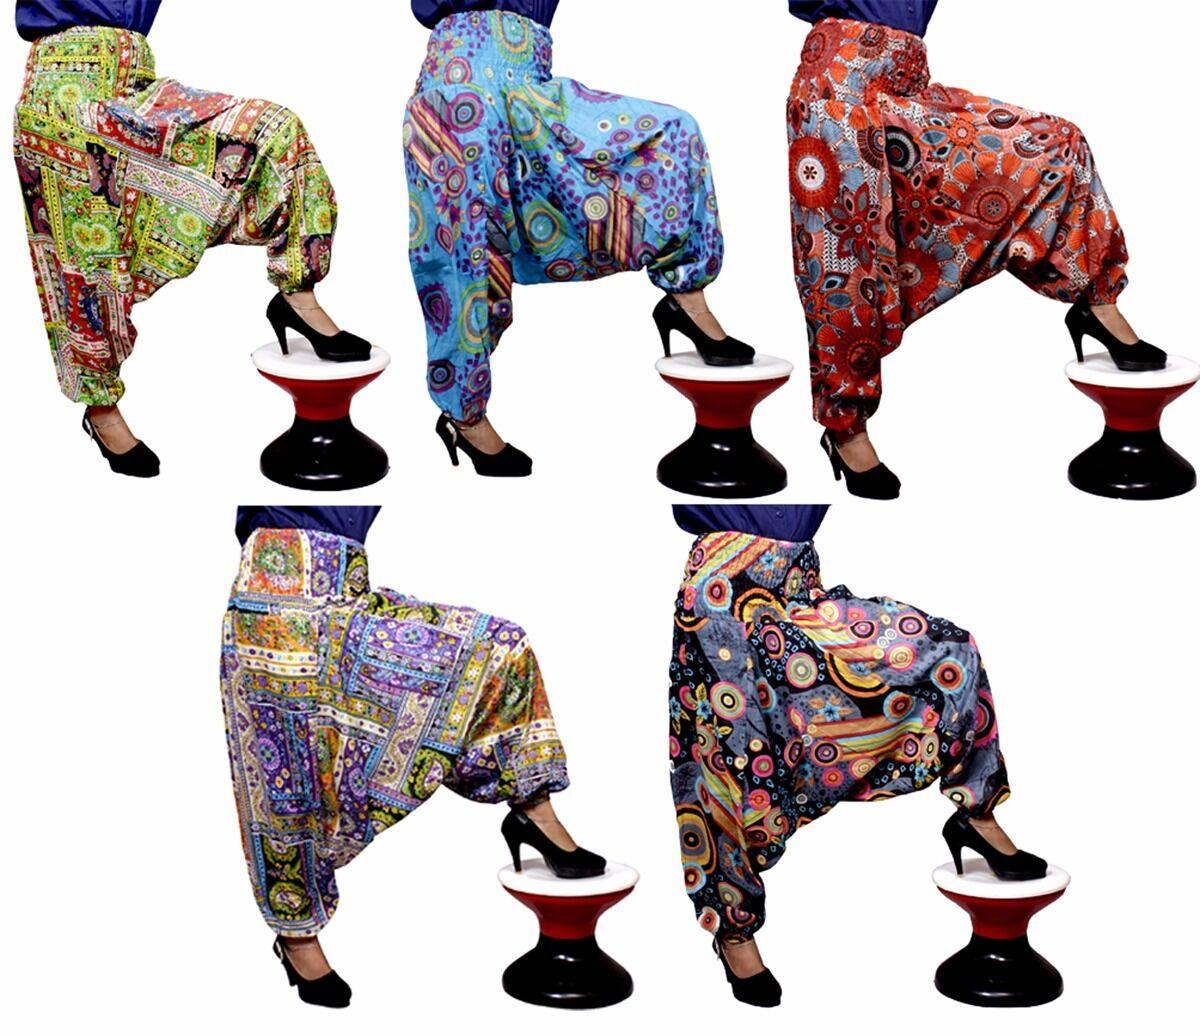 Apparels India 10Pc Aladdin Afghani Harem Baggy USA Hippie Pants Wholesale Lot